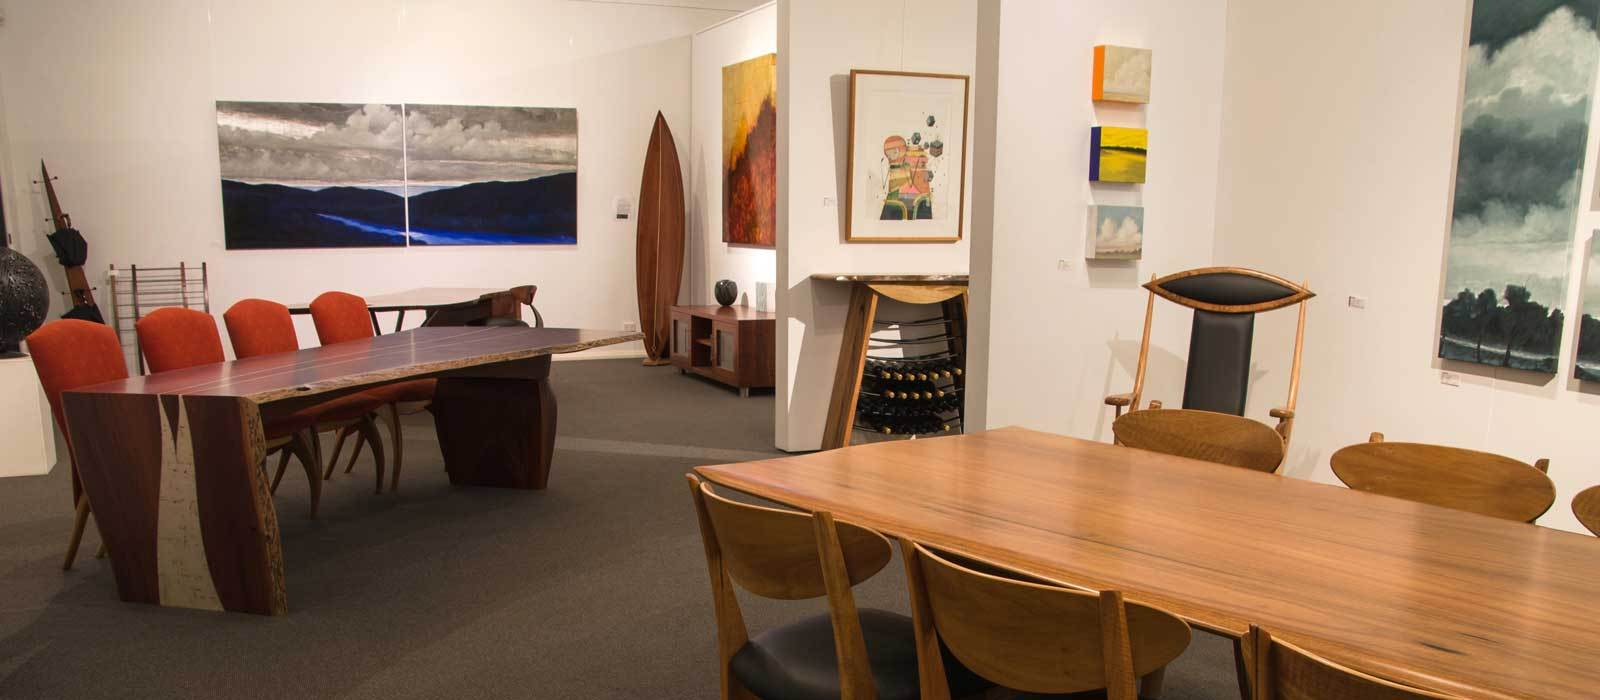 Inside Gallery 2 2014 E1414293446551